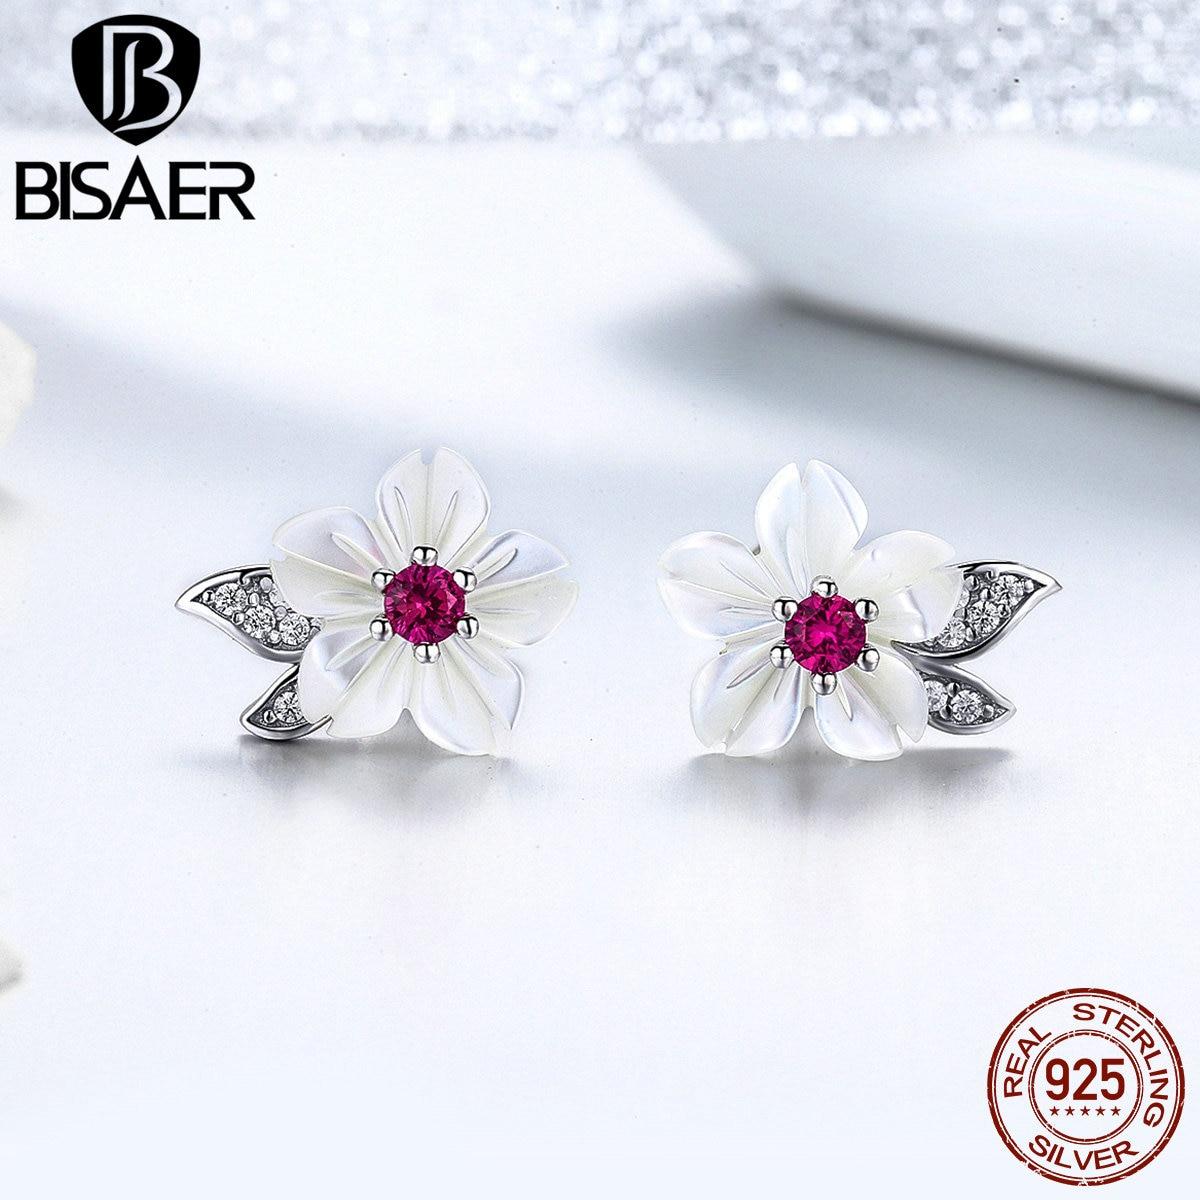 BISAER 925 Sterling Silver Blooming Shell Flower Stud Earrings Orchid Flower Small Women Earrings Sterling Silver Jewelry EFE055